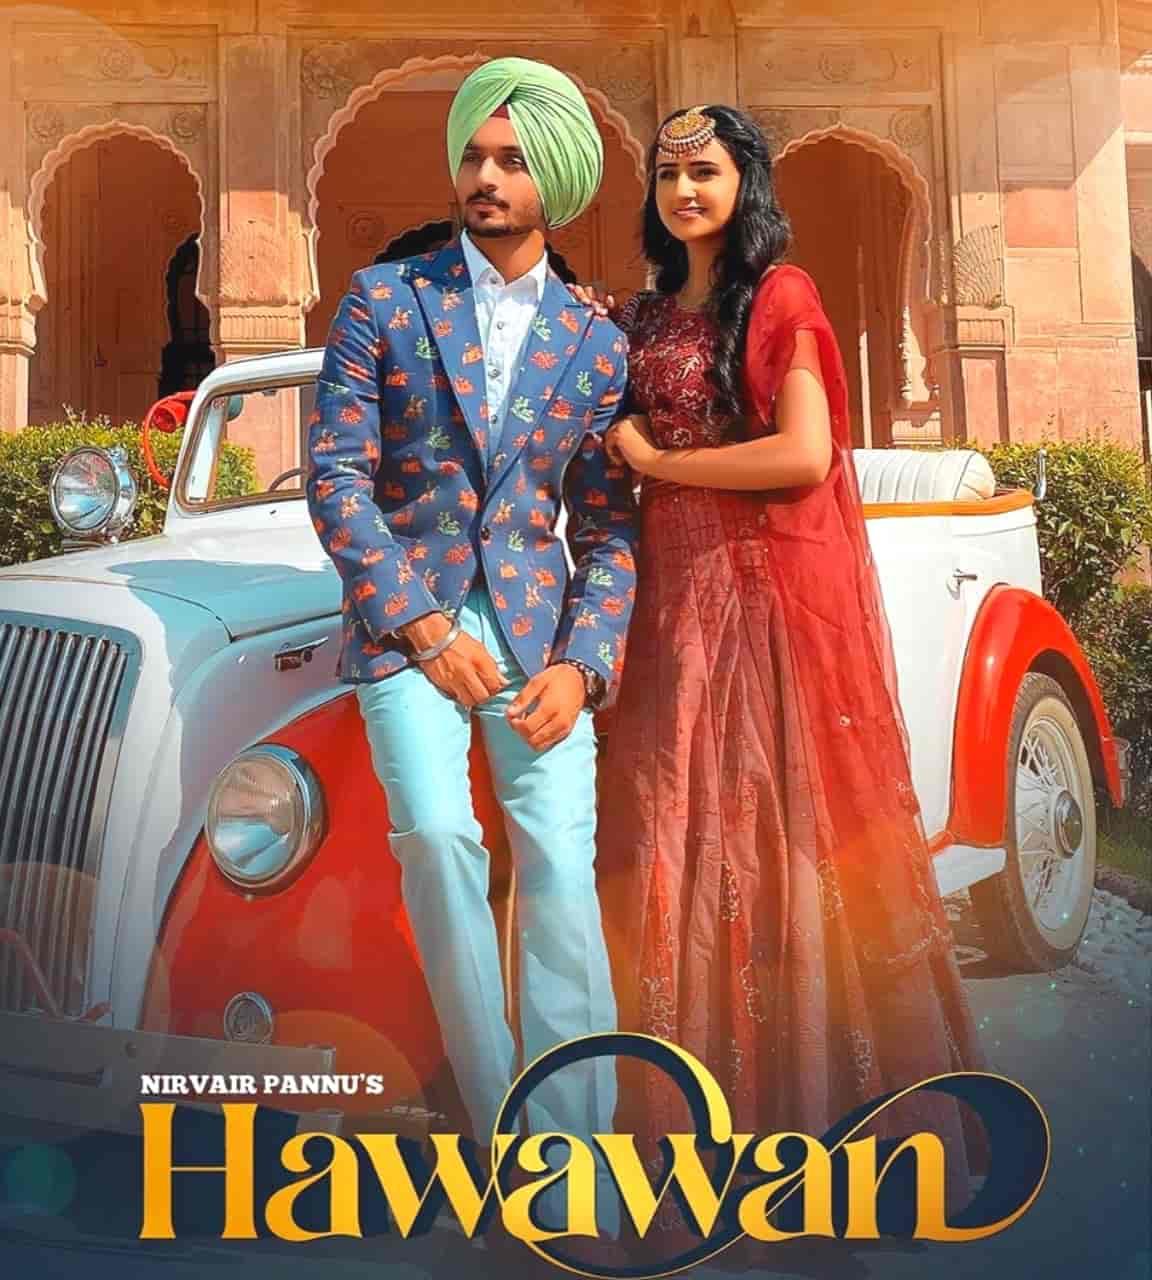 Hawawan Punjabi Song Image Features Nirvair Pannu.